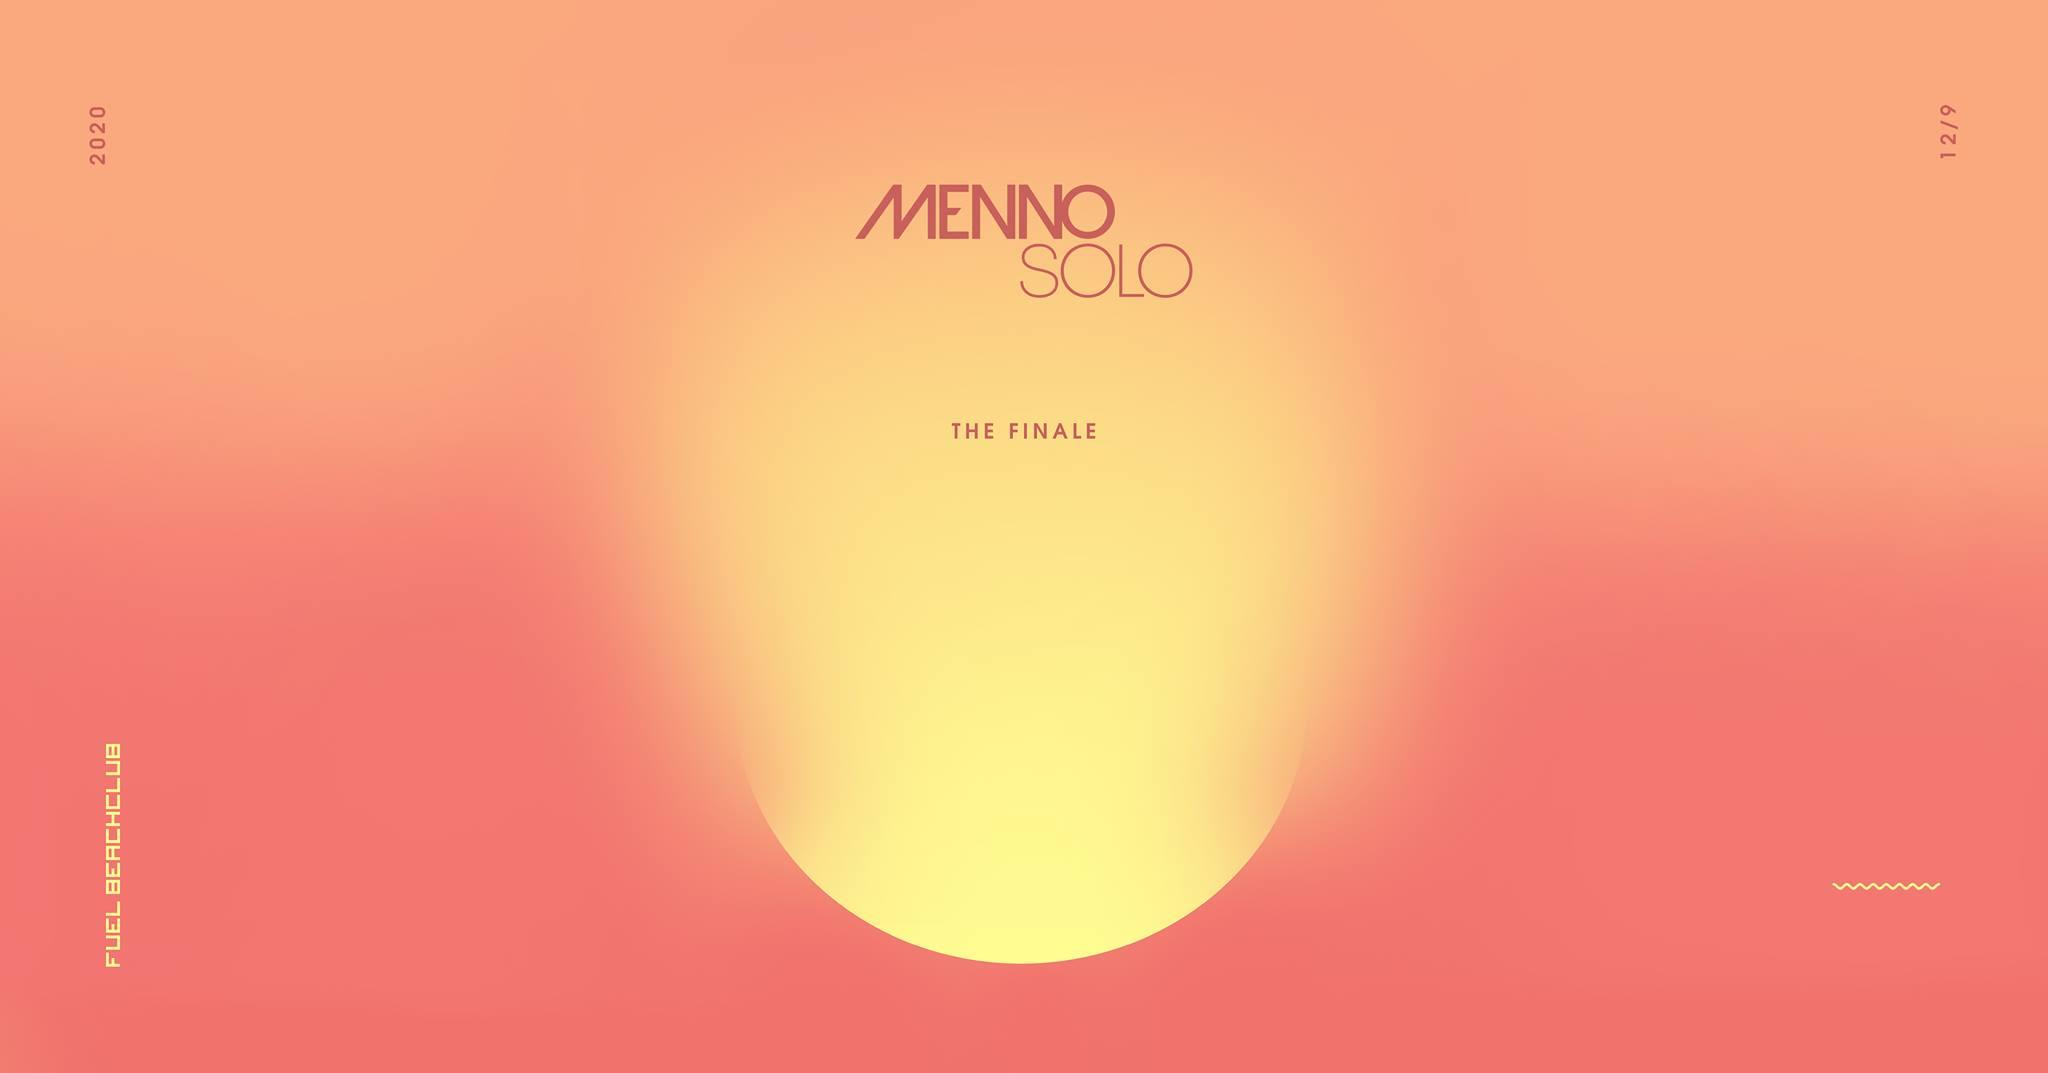 12.09.2020 Menno Solo - The Finale, Bloemendaal